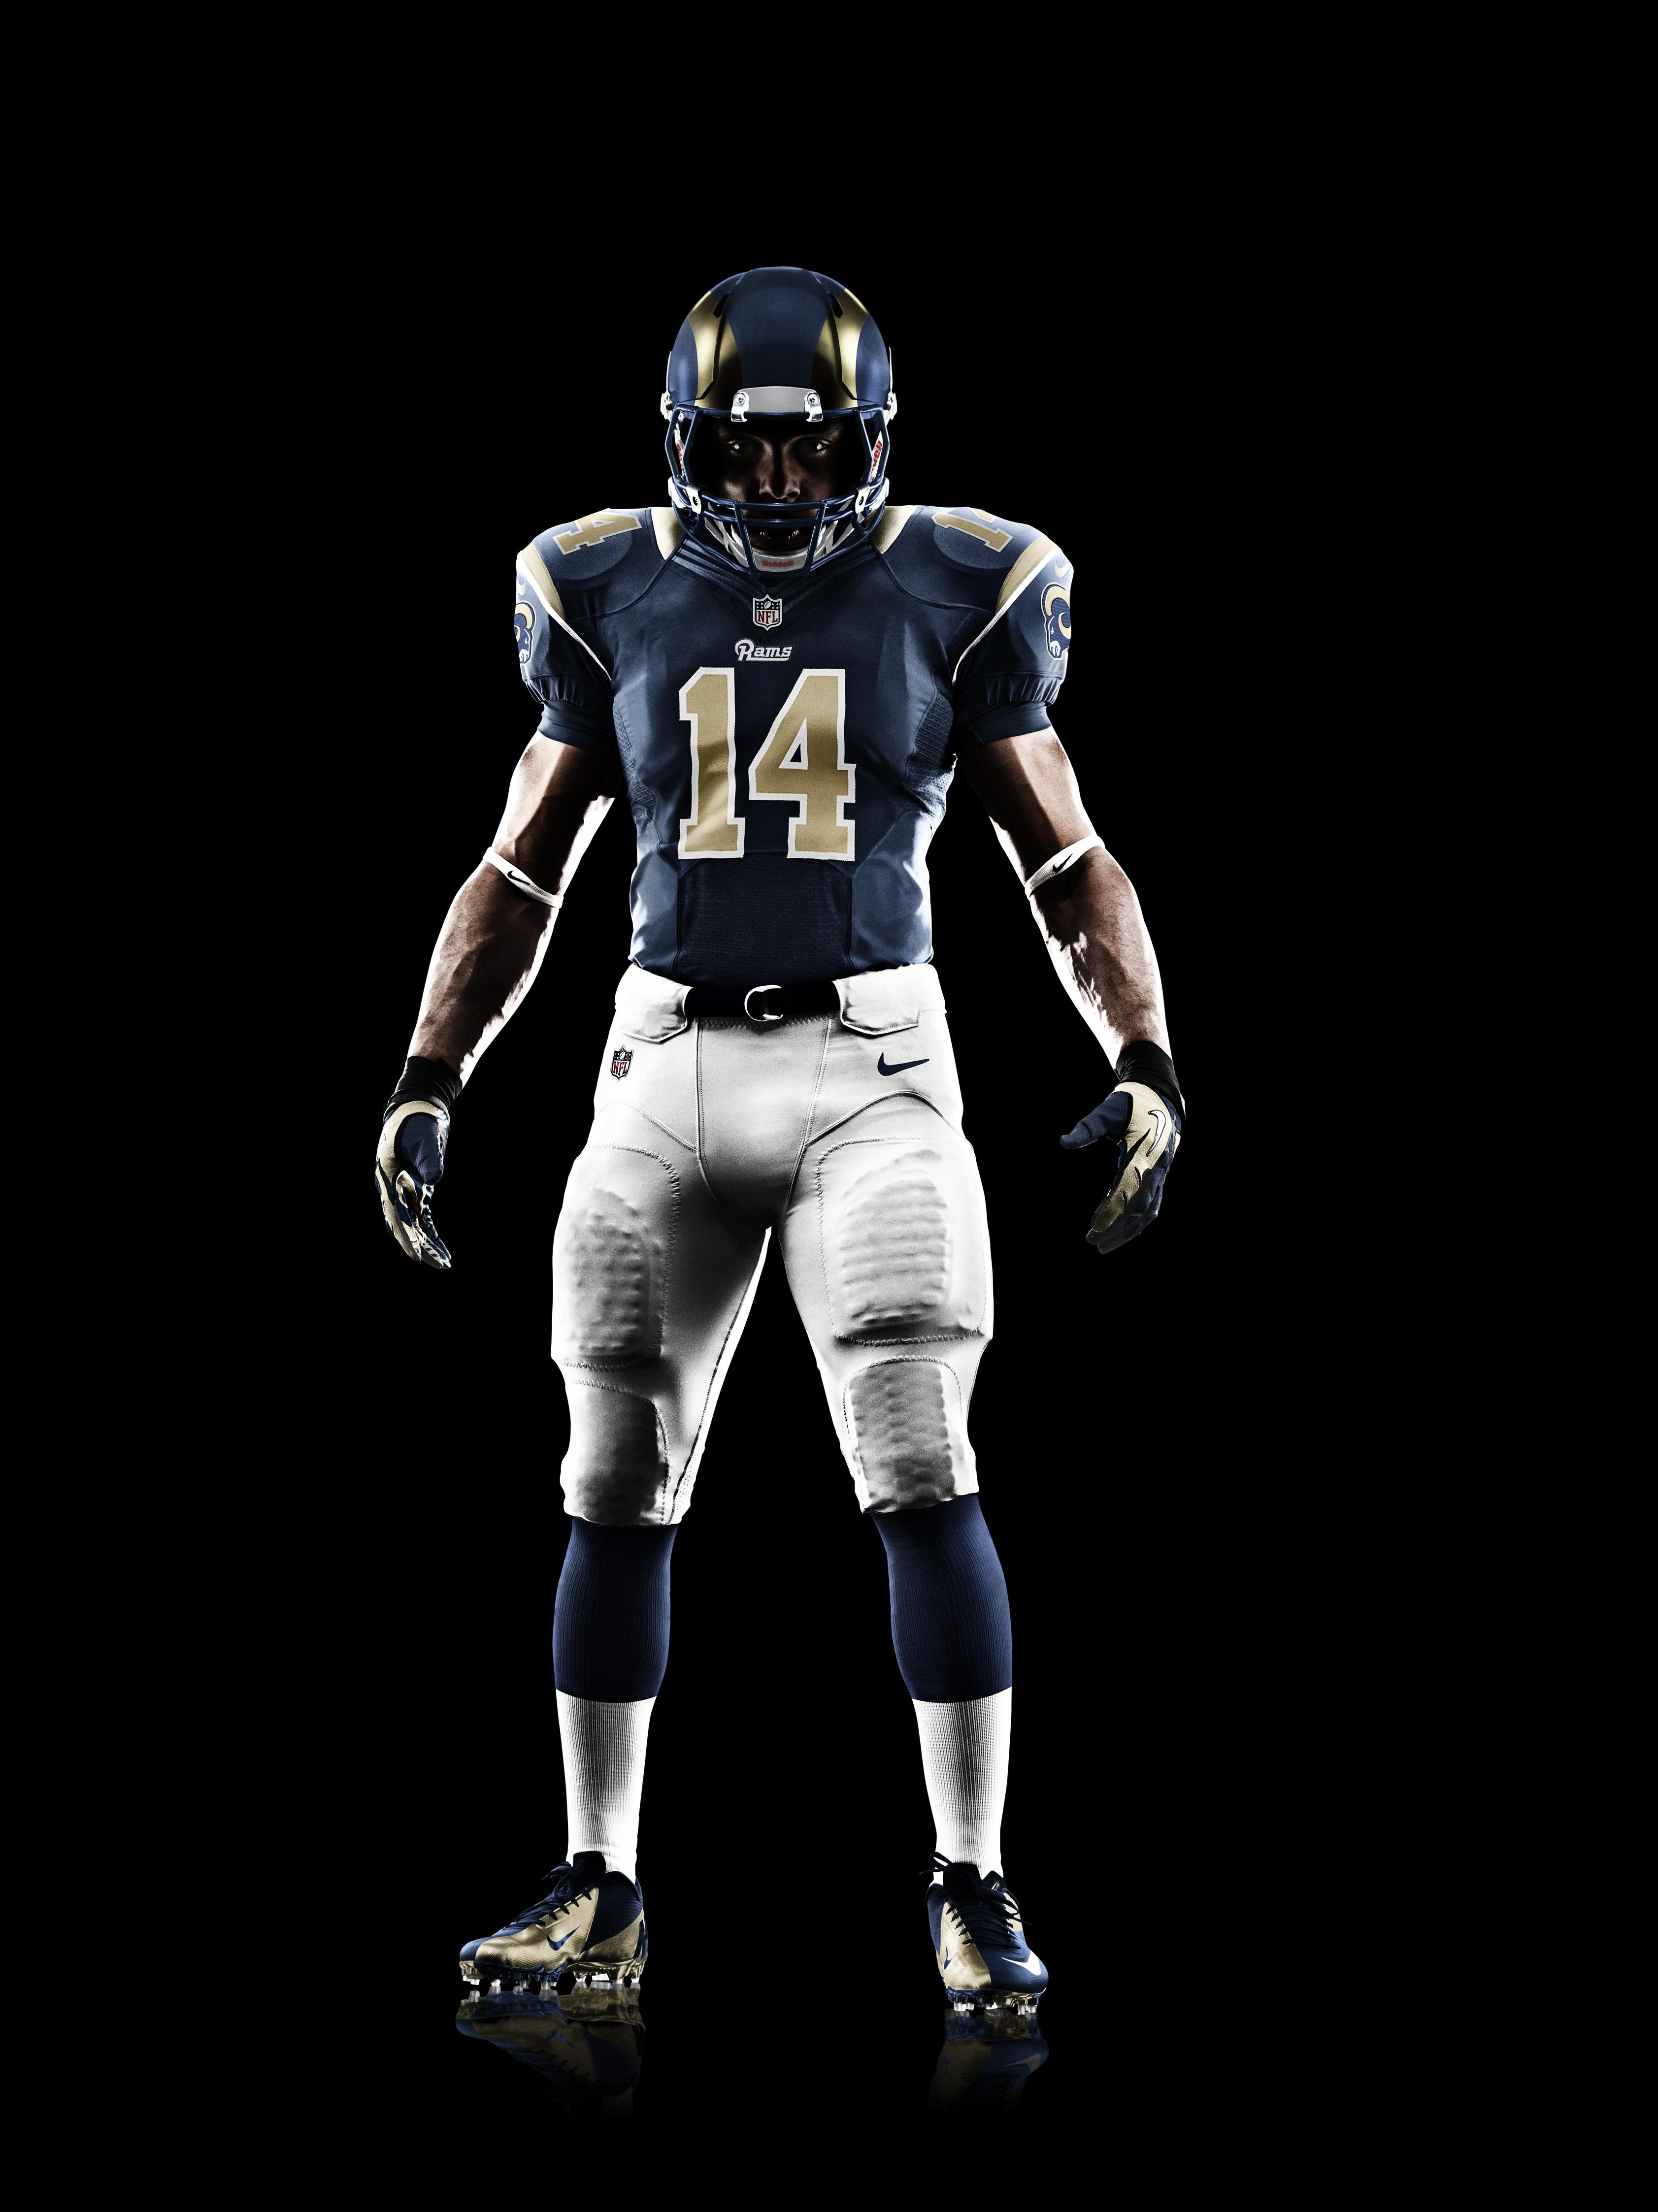 Nike News - St. Louis Rams 2012 Nike Football Uniform